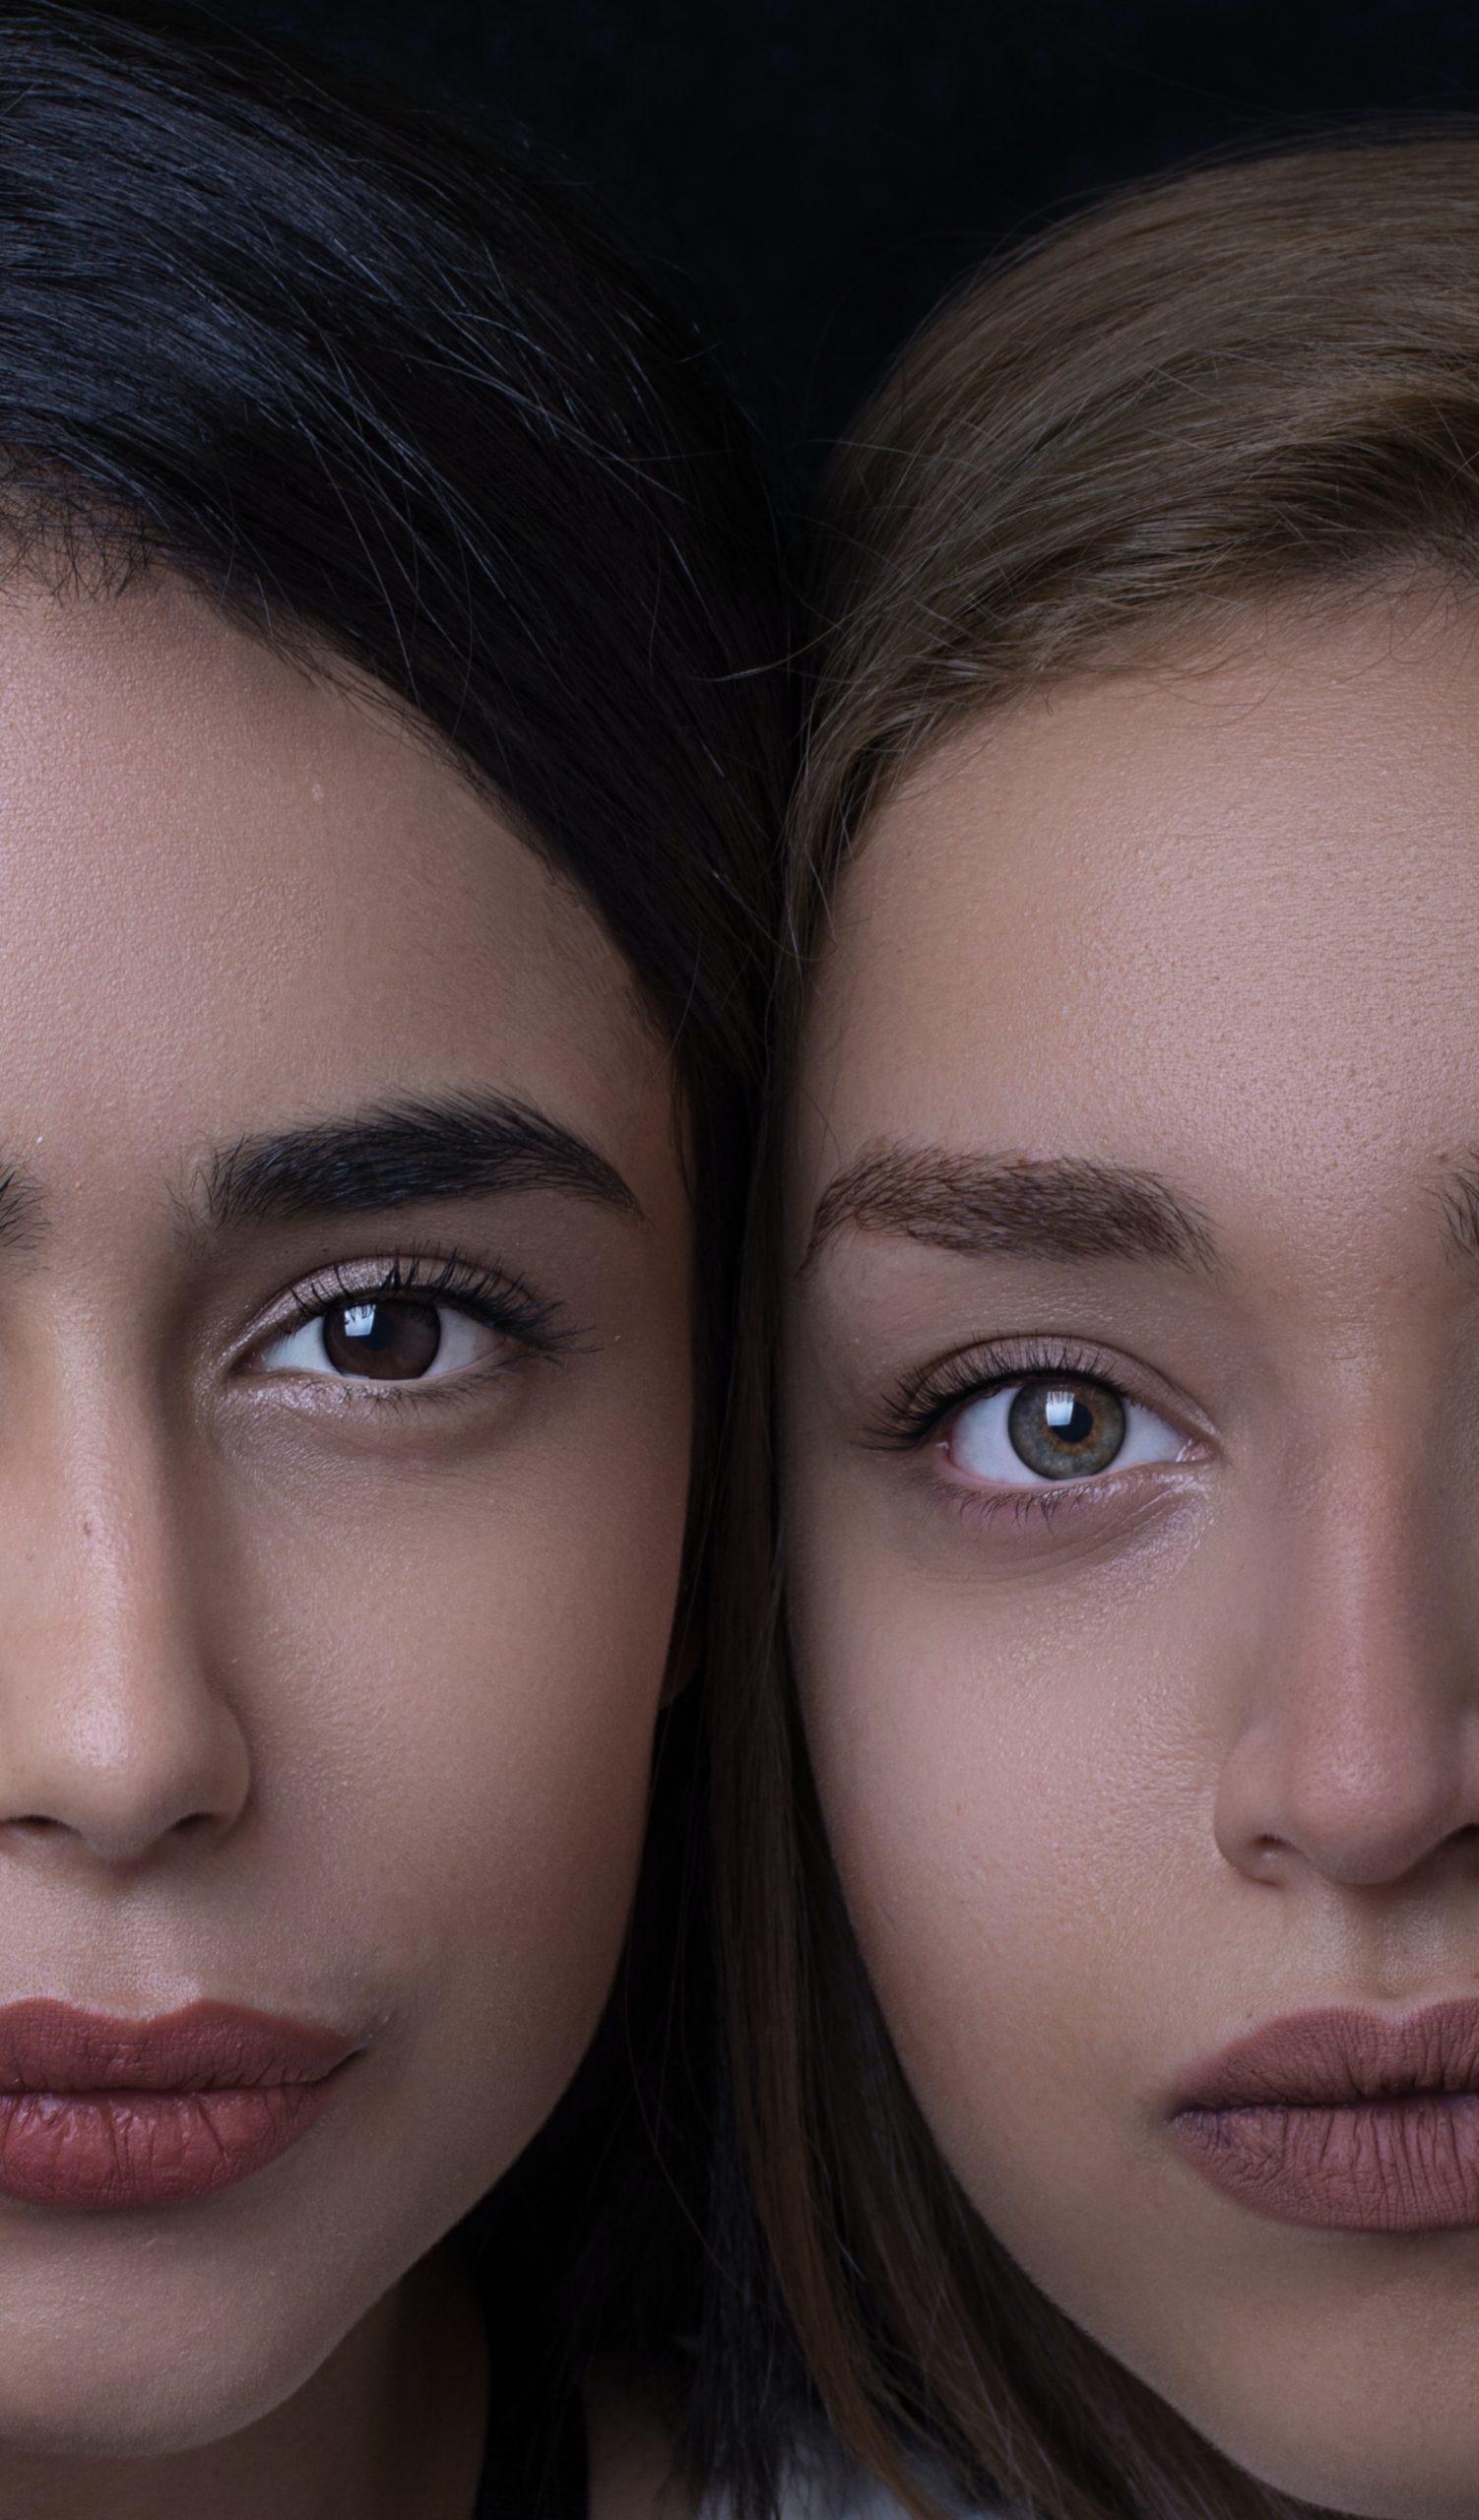 close up 2 beautiful women faces hadis safari unsplash